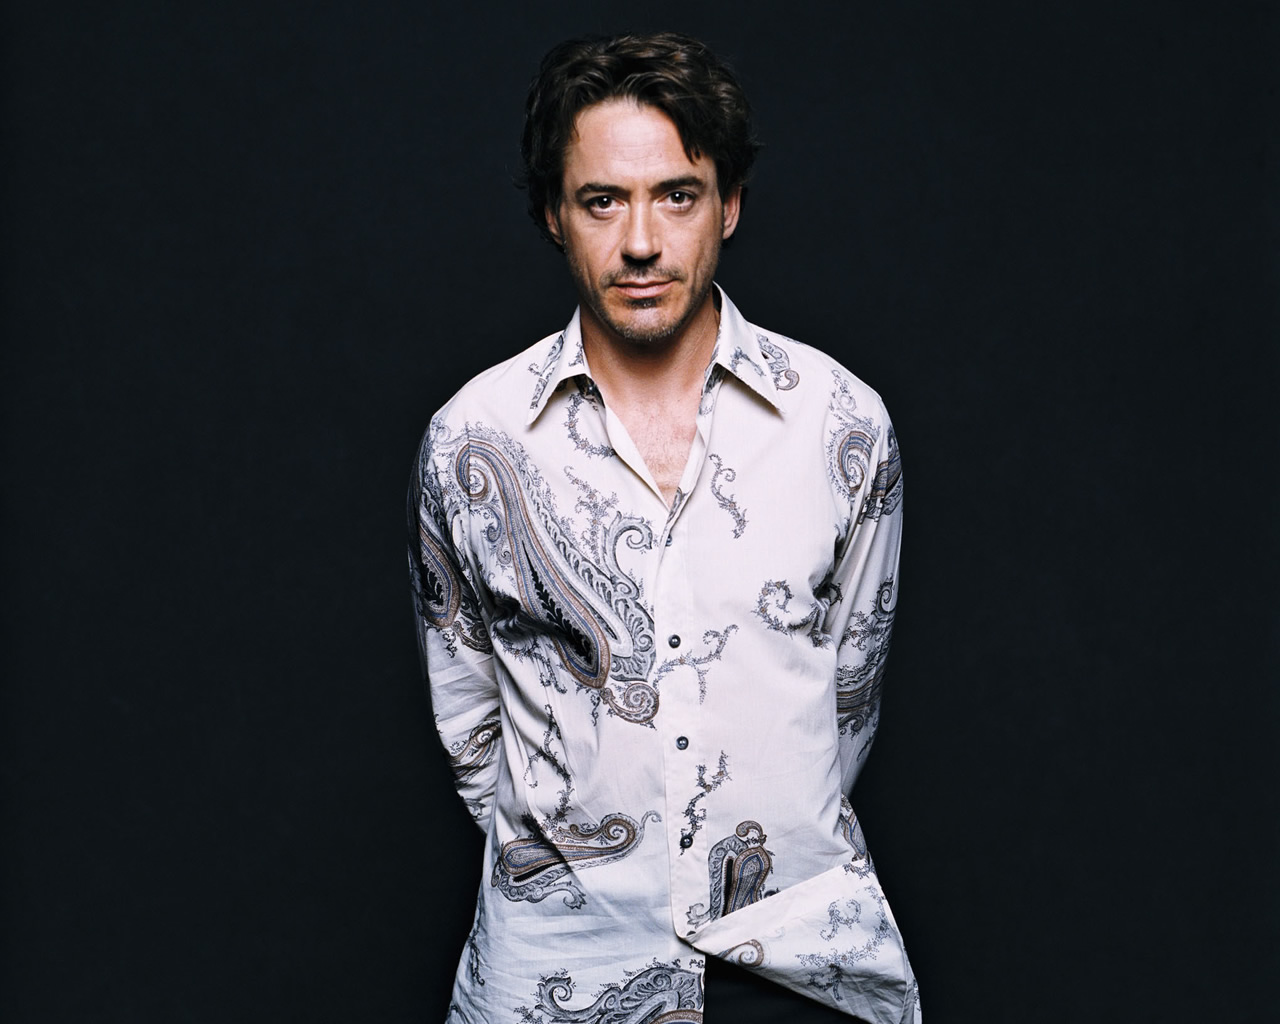 Robert Downey Jr Wallpapers Robert Downey